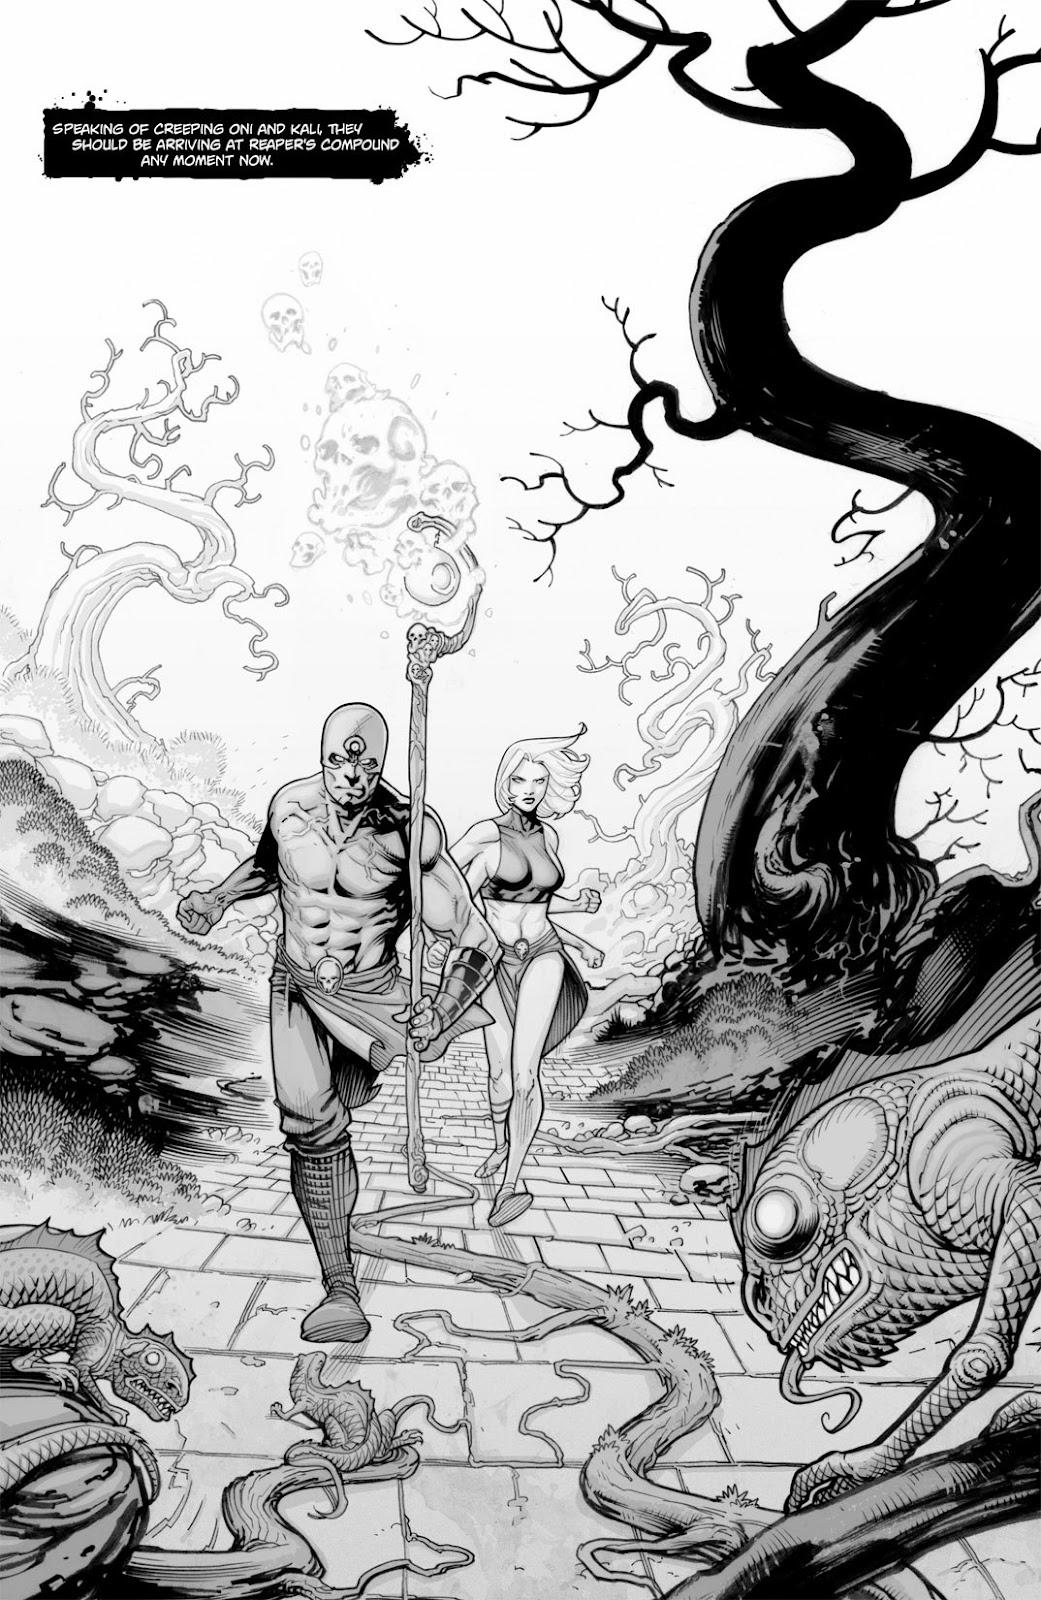 Read online Reaper comic -  Issue #2 - 6